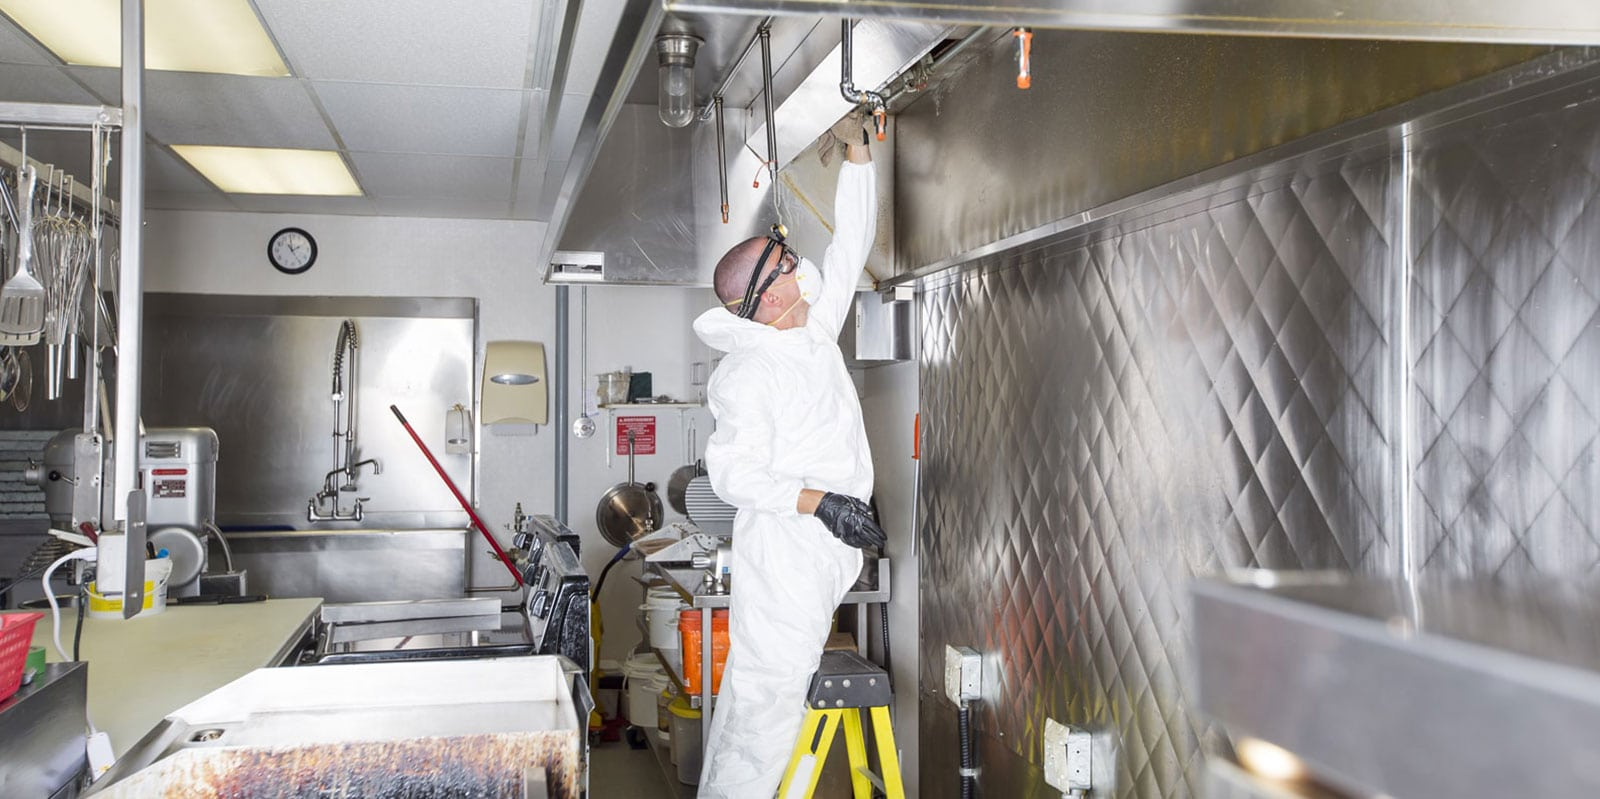 regular commercial kitchen deep cleaning uk